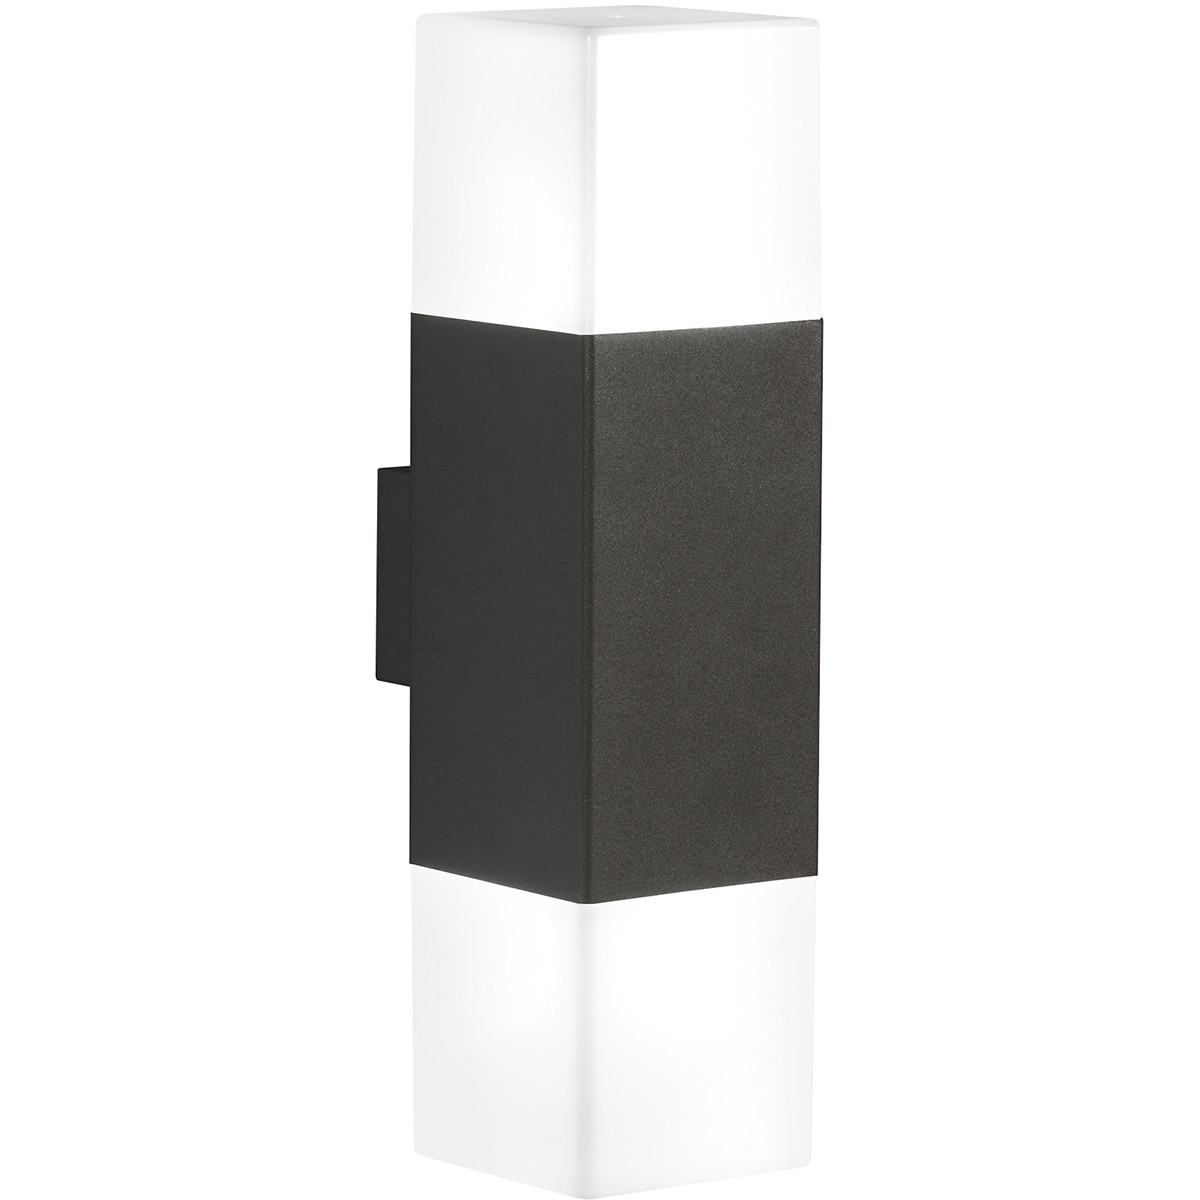 LED Tuinverlichting - Tuinlamp - Trion Hudsy - Wand - 8W - Warm Wit 3000K - Vierkant - Mat Zwart - A